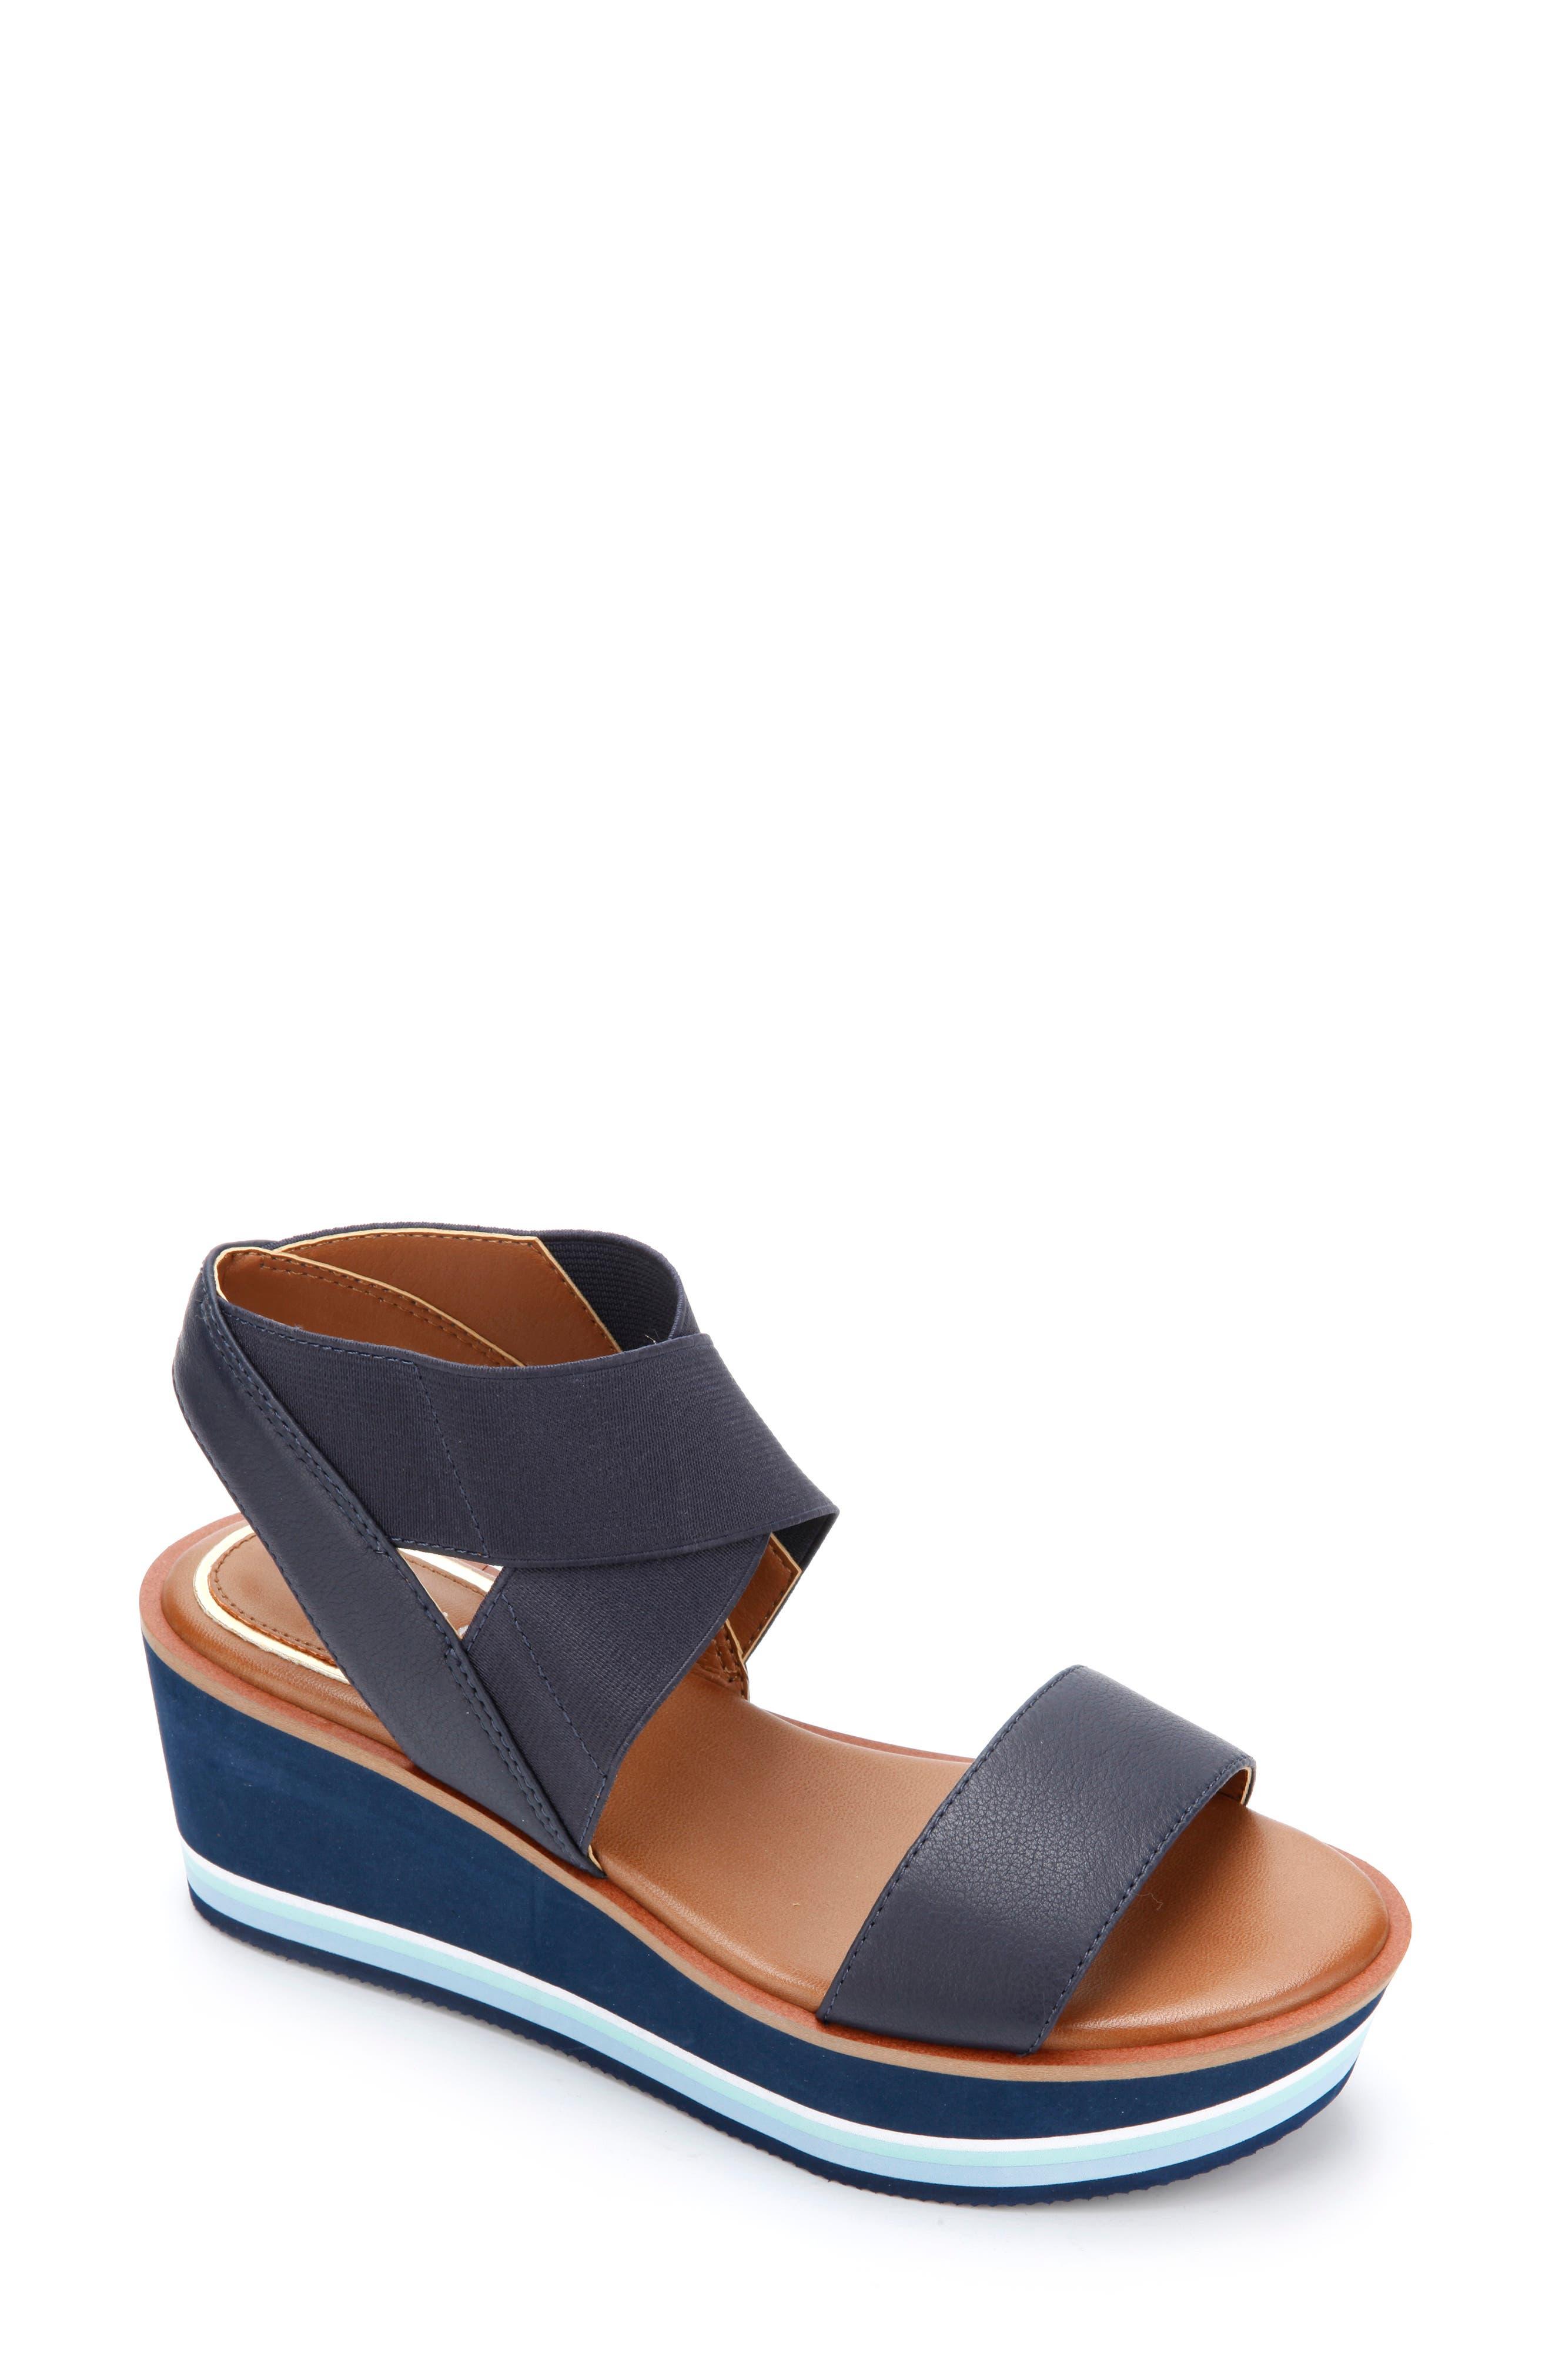 Harlow Wedge Sandal